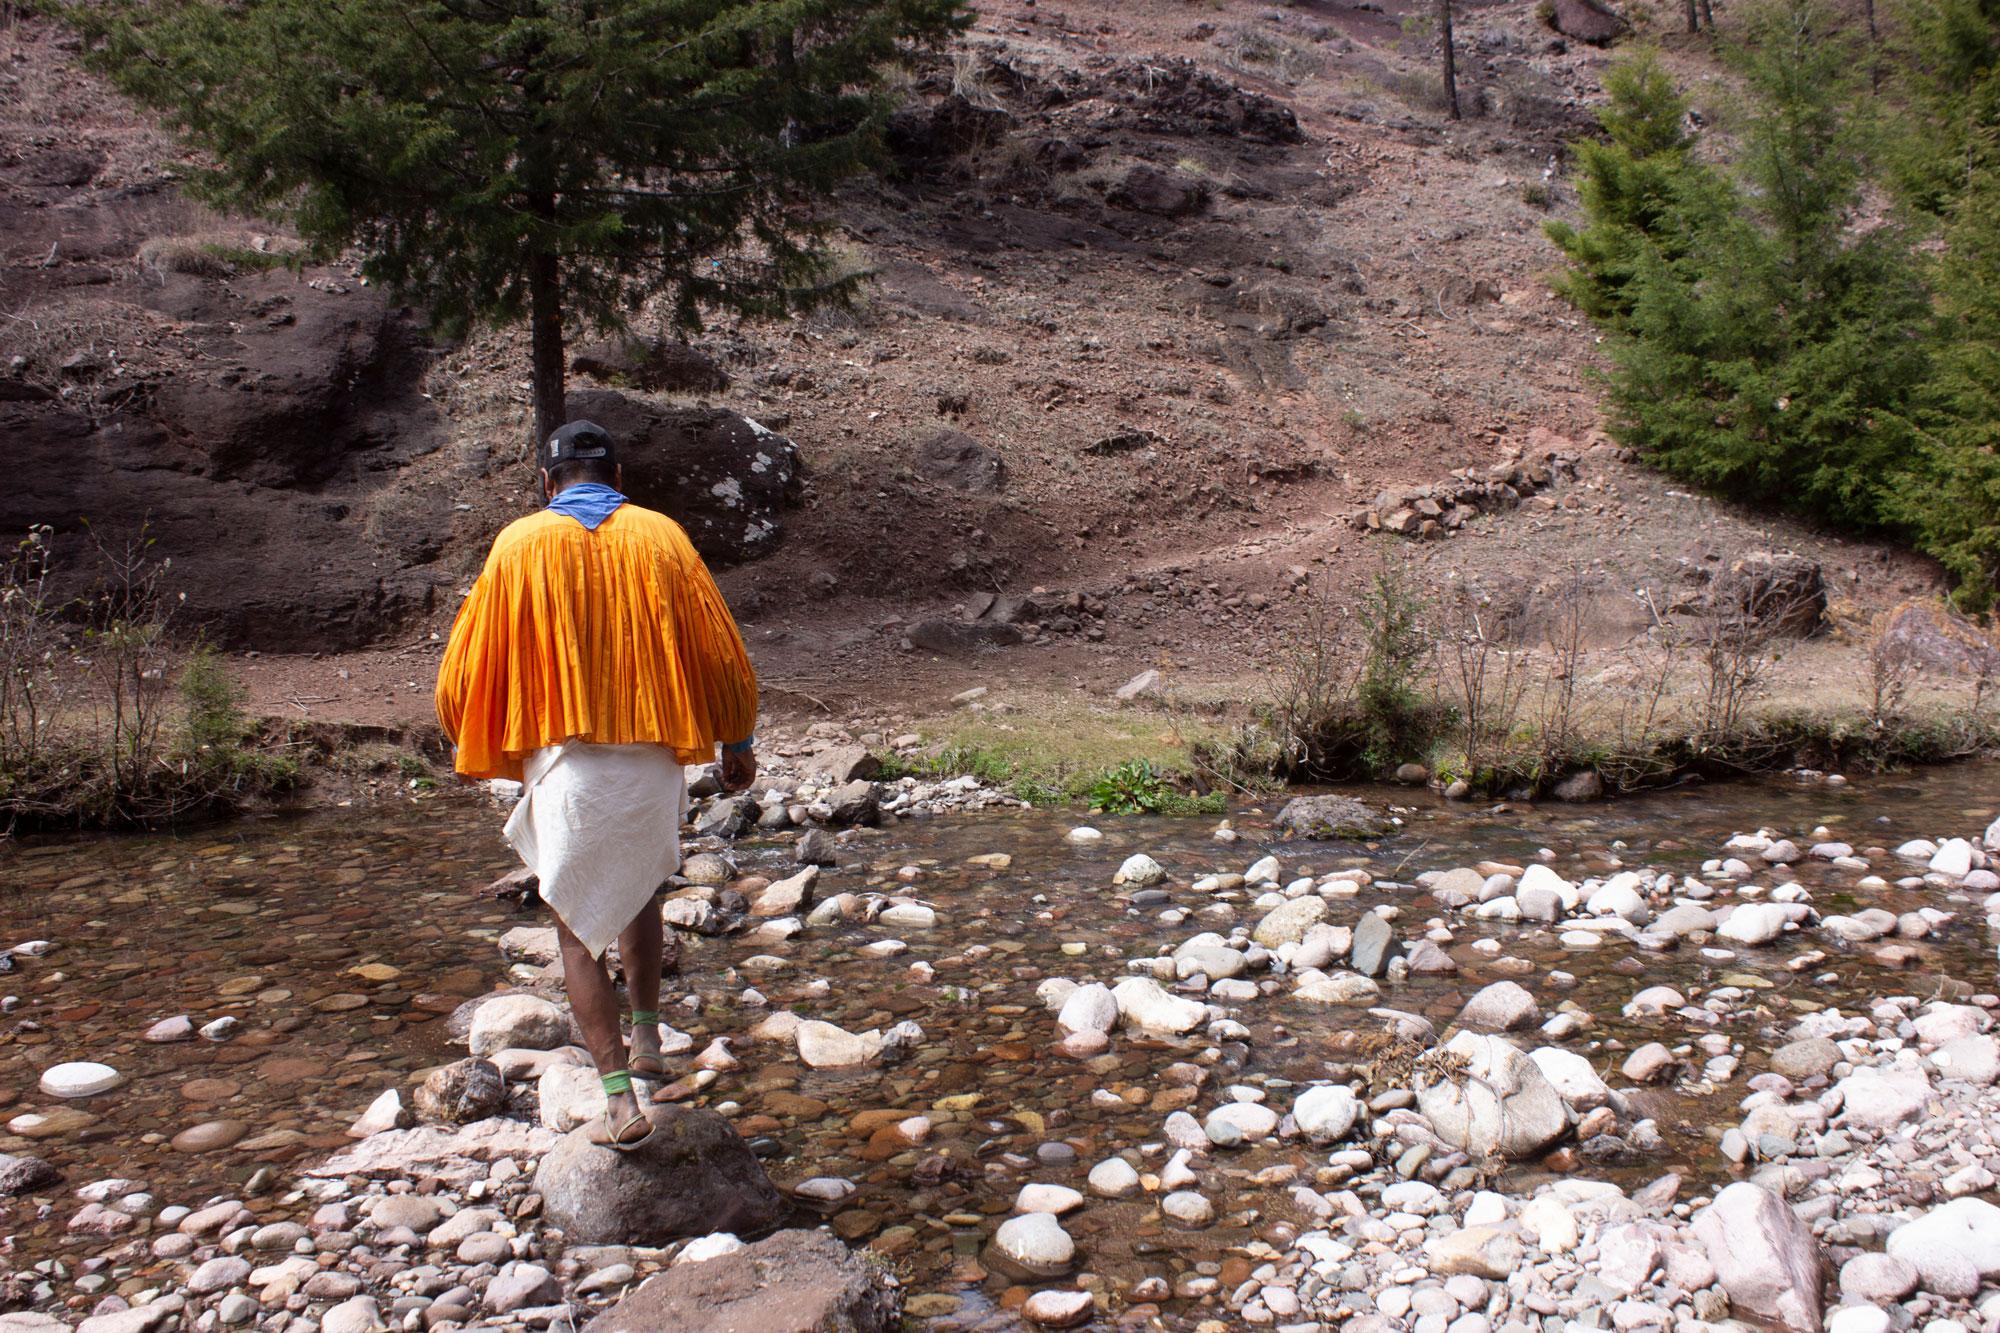 Manuel Luna on Hike